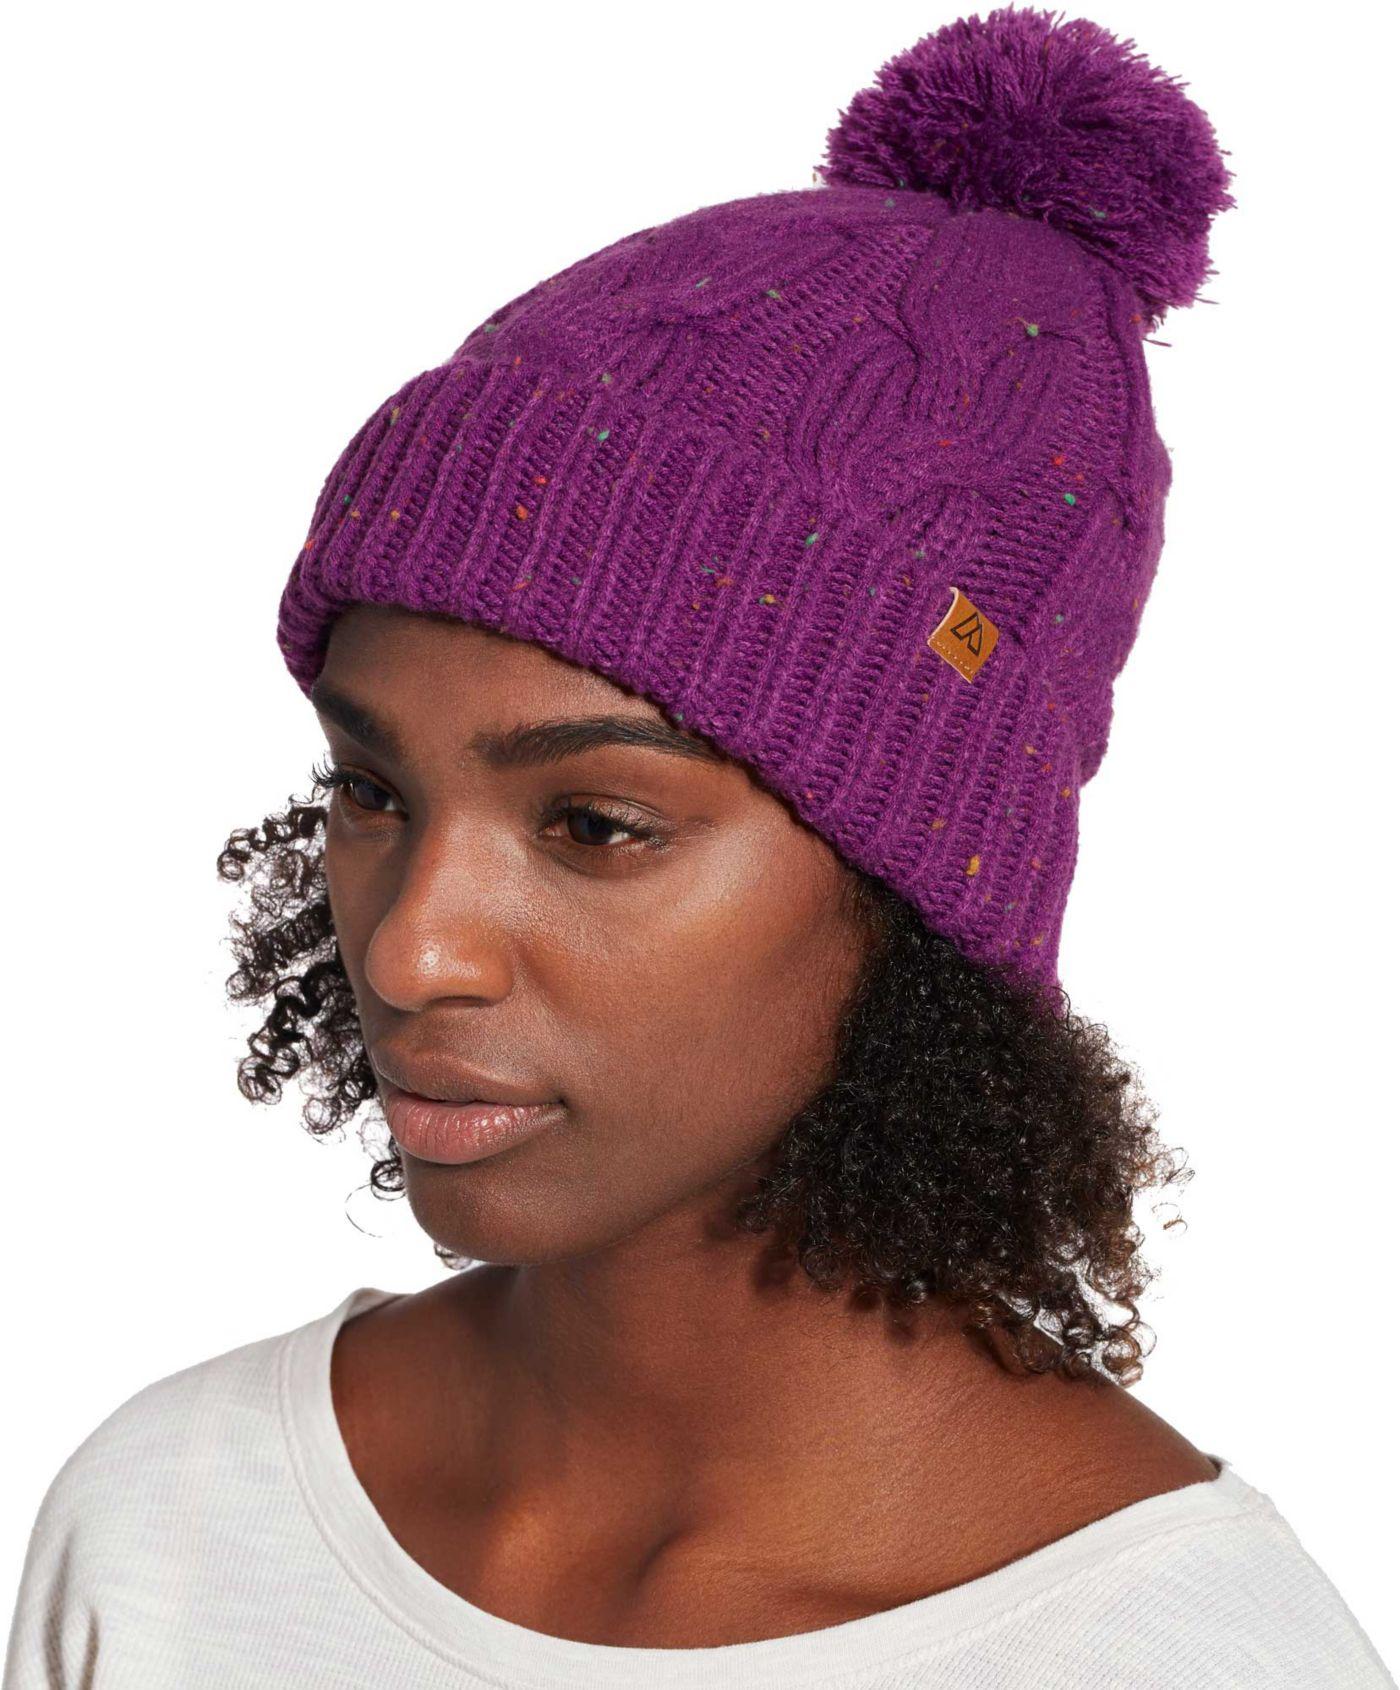 Alpine Design Women's Cable Knit Beanie